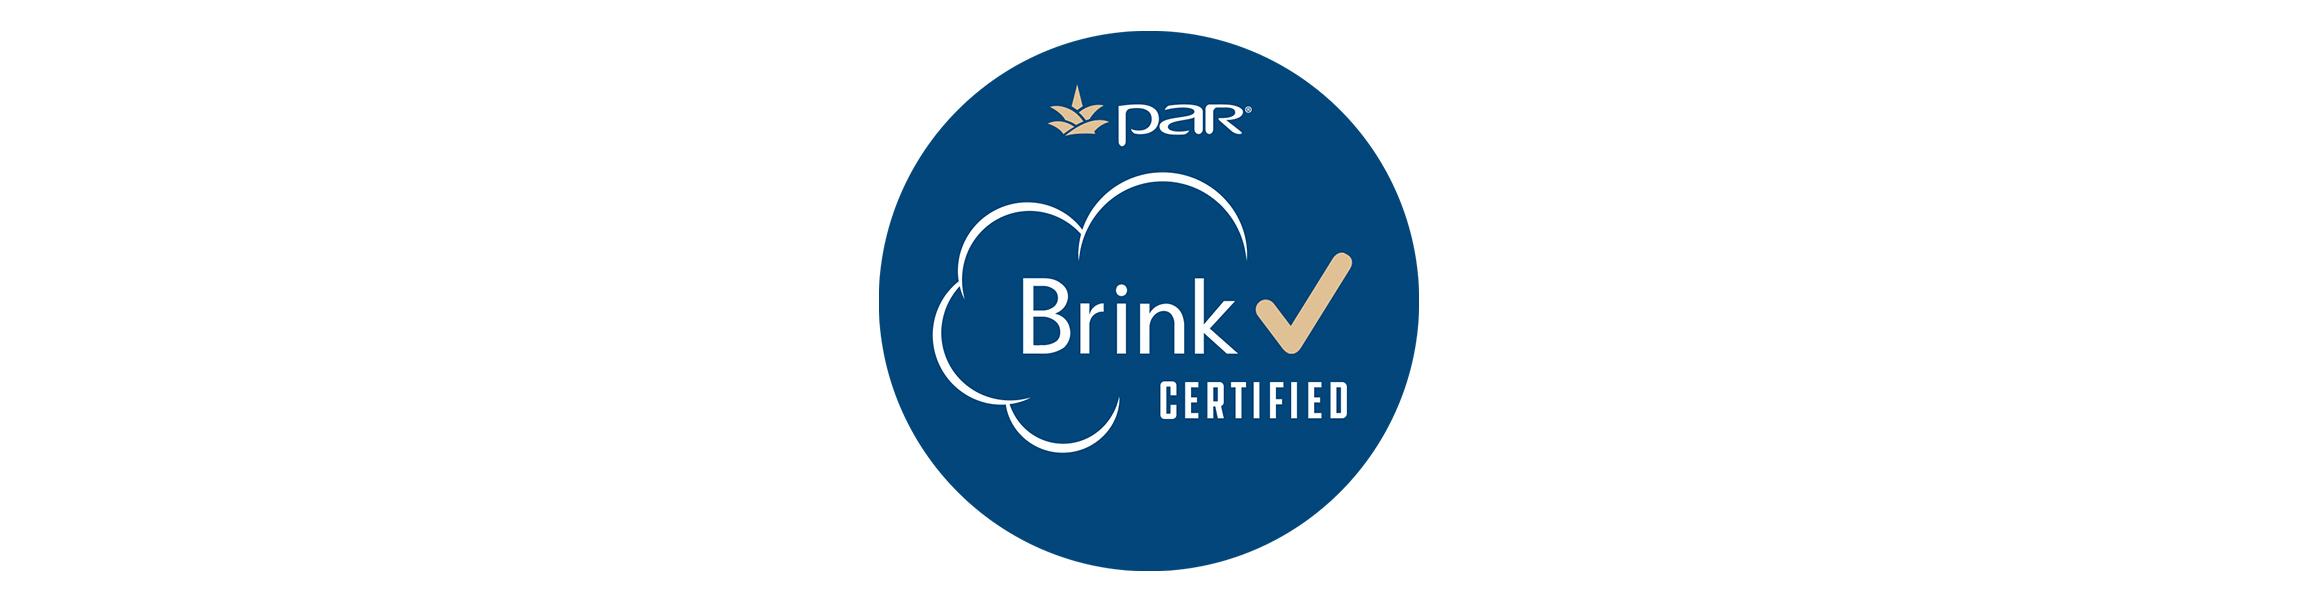 Brink-Certified